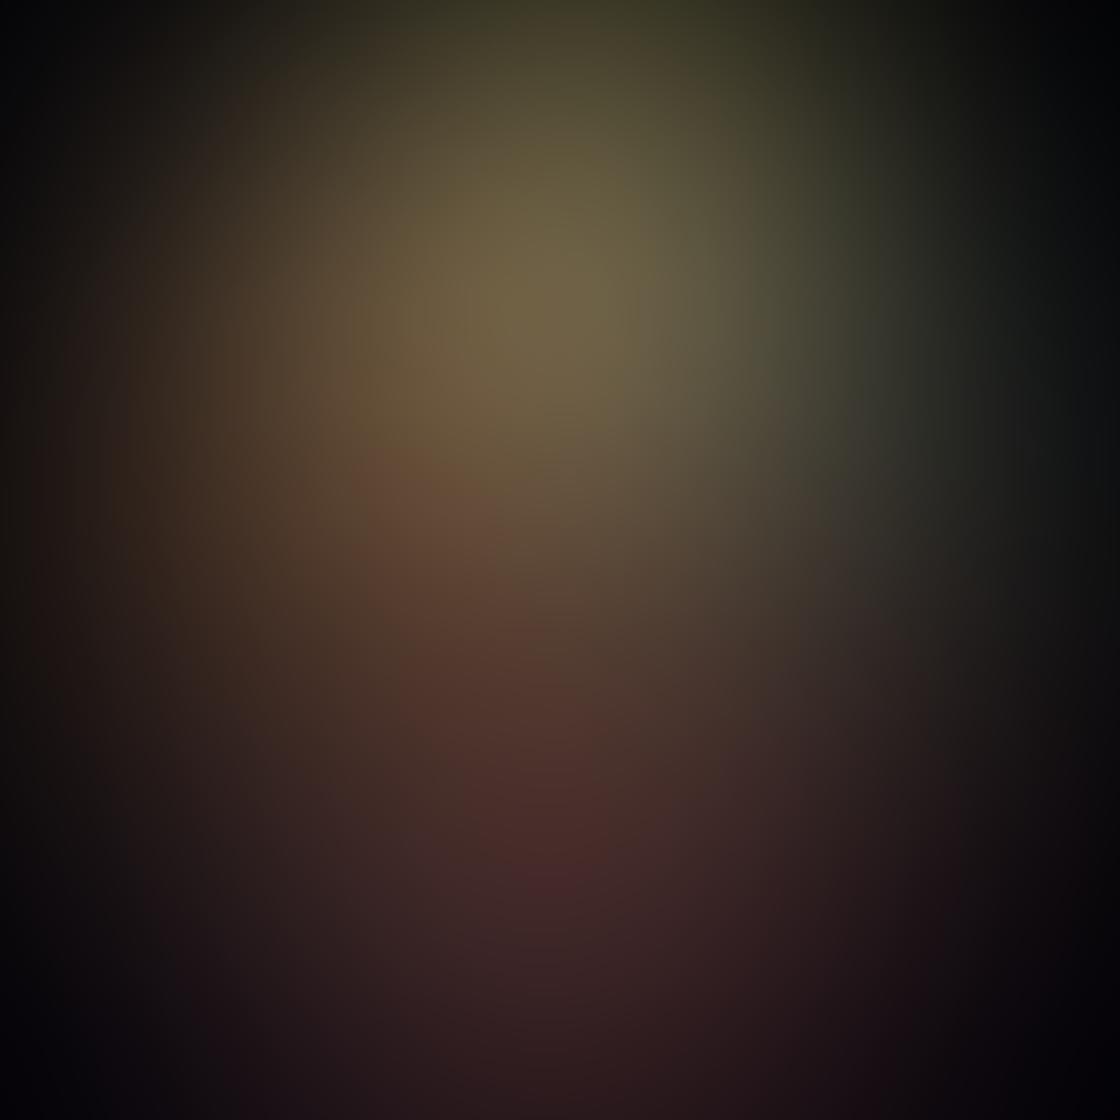 iPhone Photos Low Angle 28